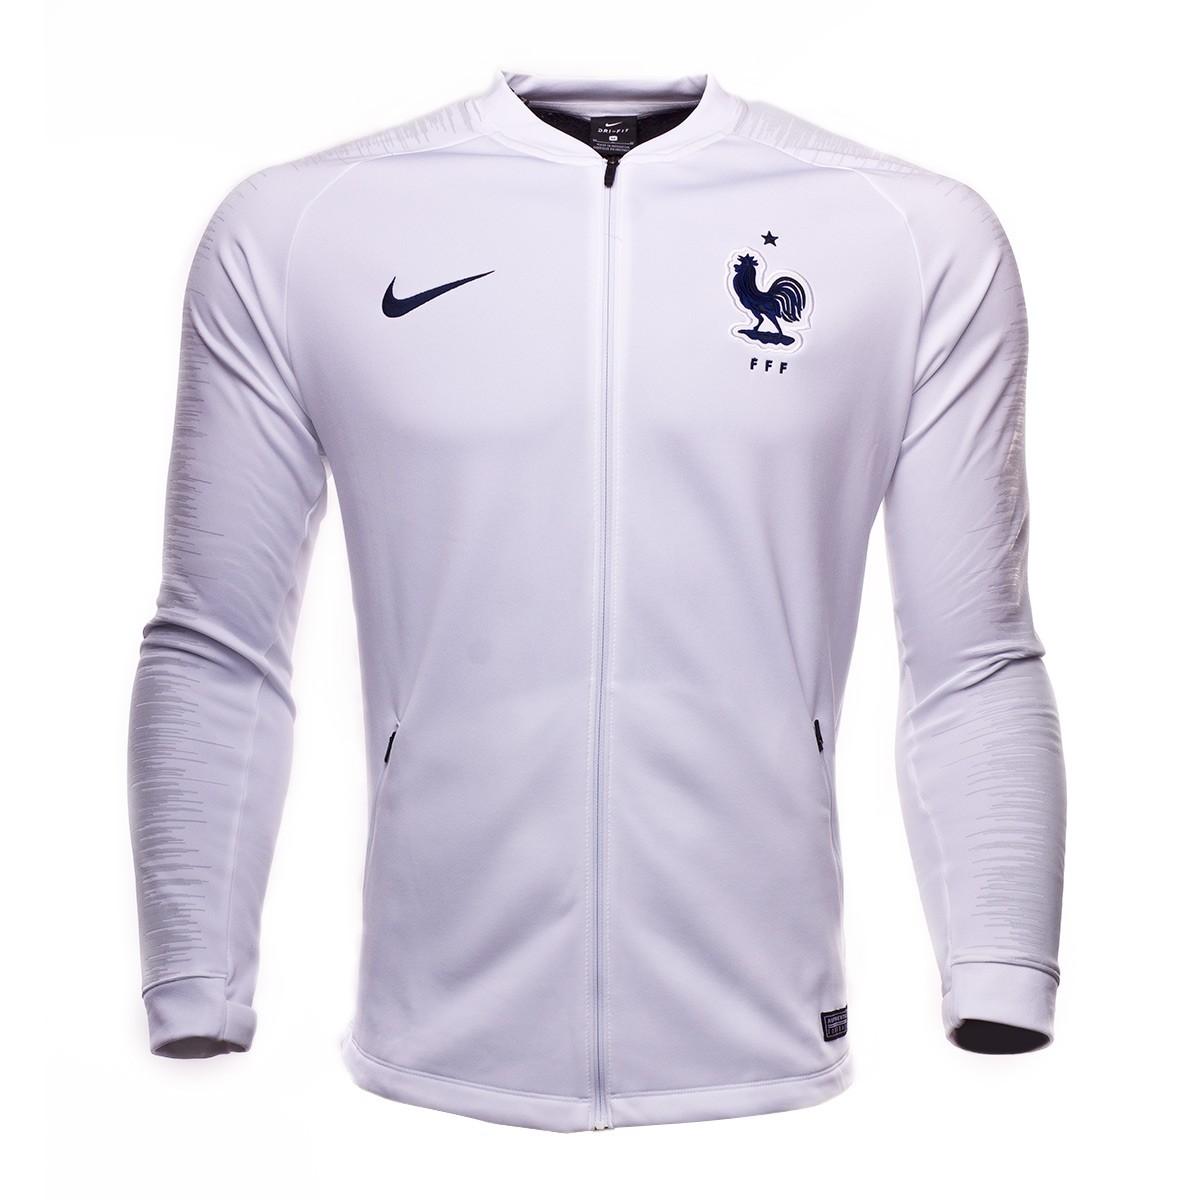 093fbd0ae Jacket Nike France Pre-Match 2018-2019 White-Pure platinum-Obsidian -  Football store Fútbol Emotion